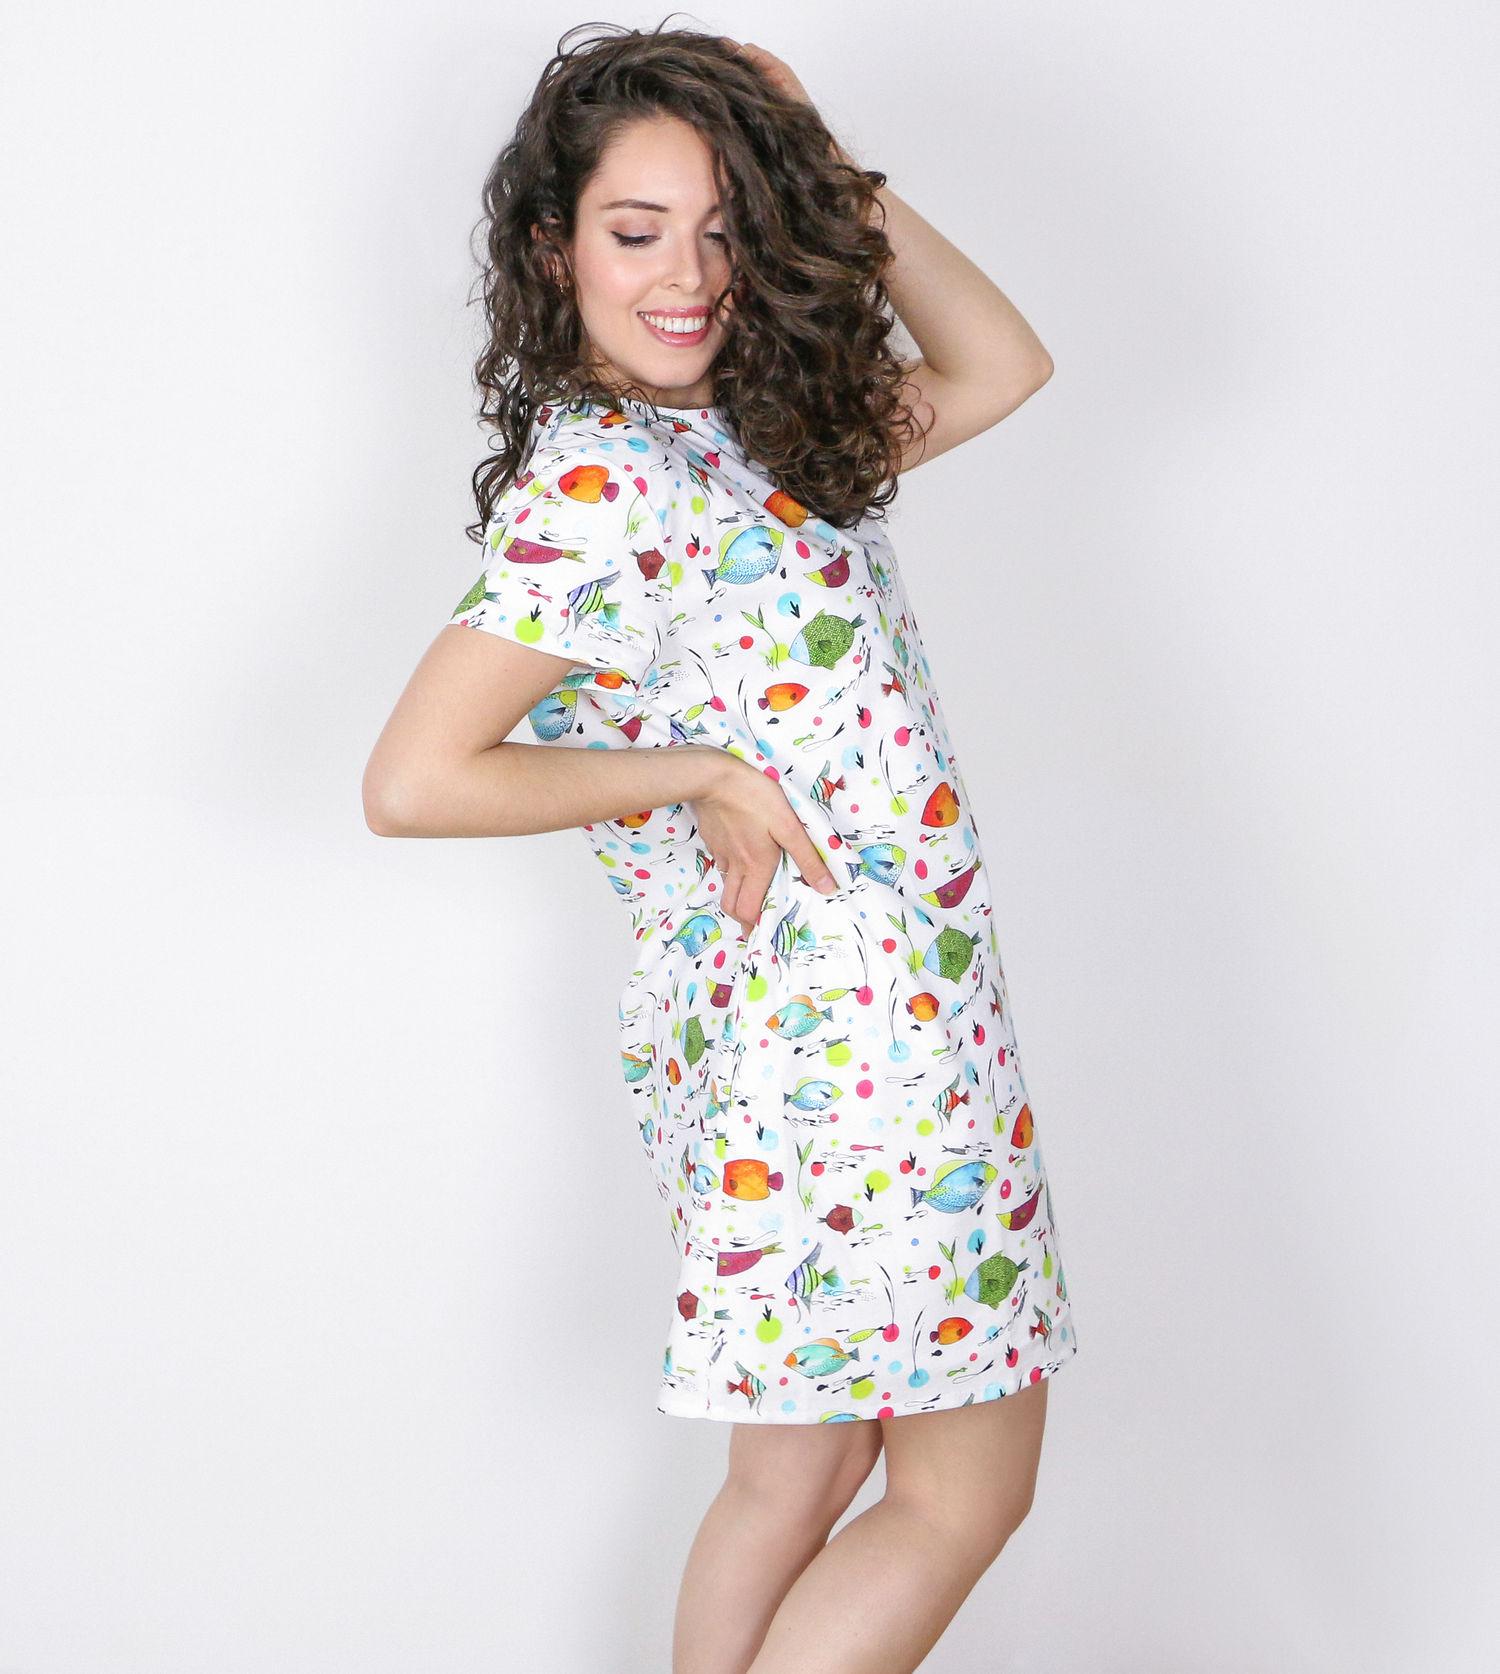 Vestido_peces_mujer_perfil.jpg